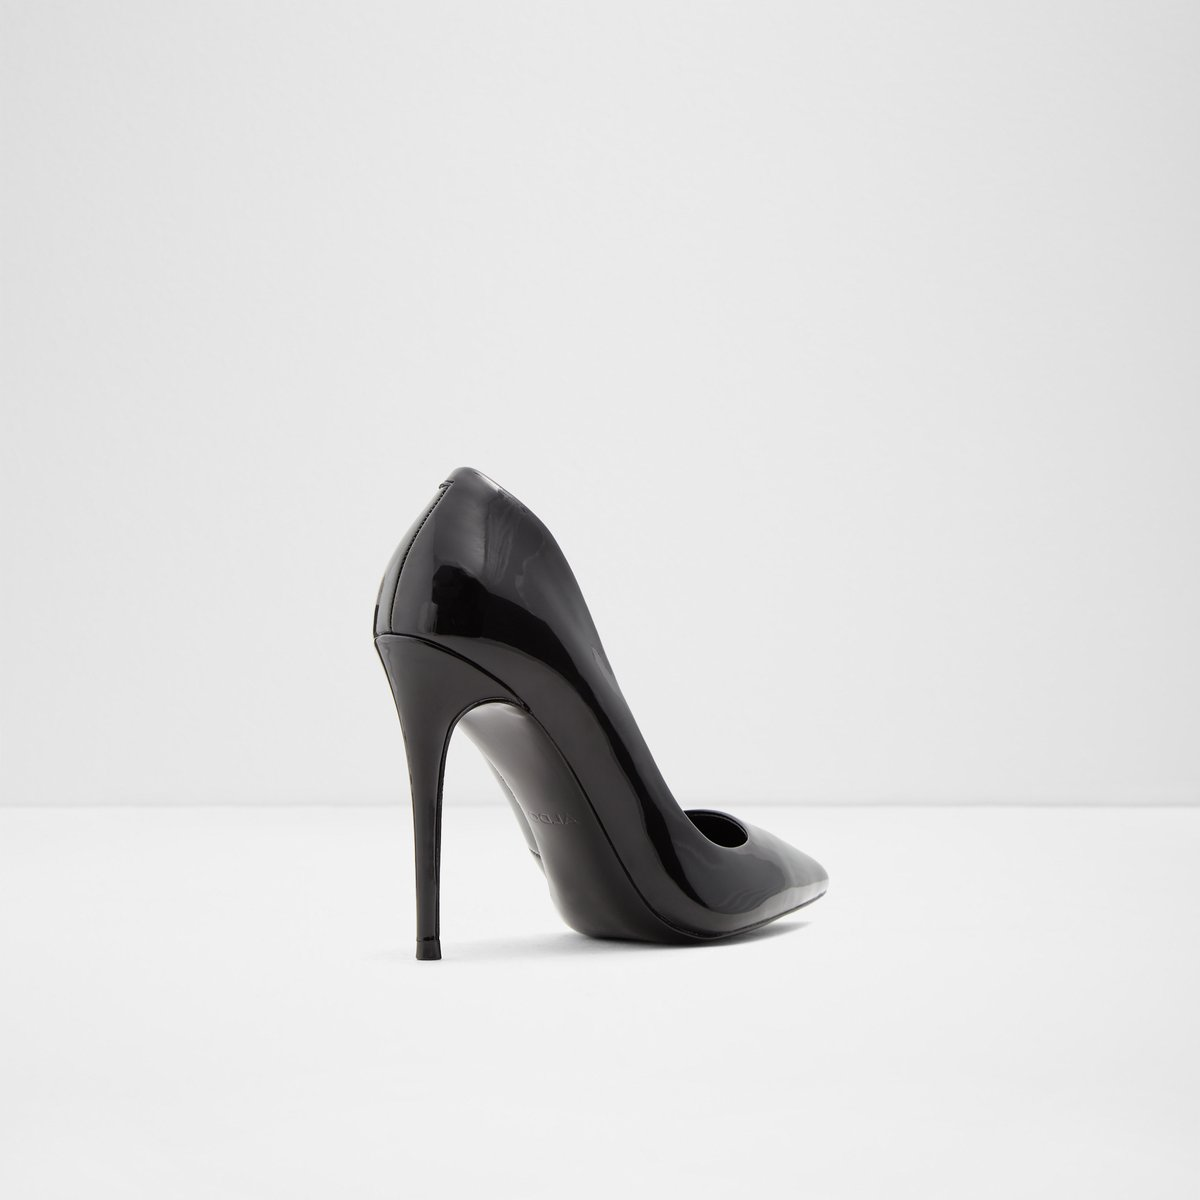 d358fbe78039 Stessy  Black Patent Women s Heels